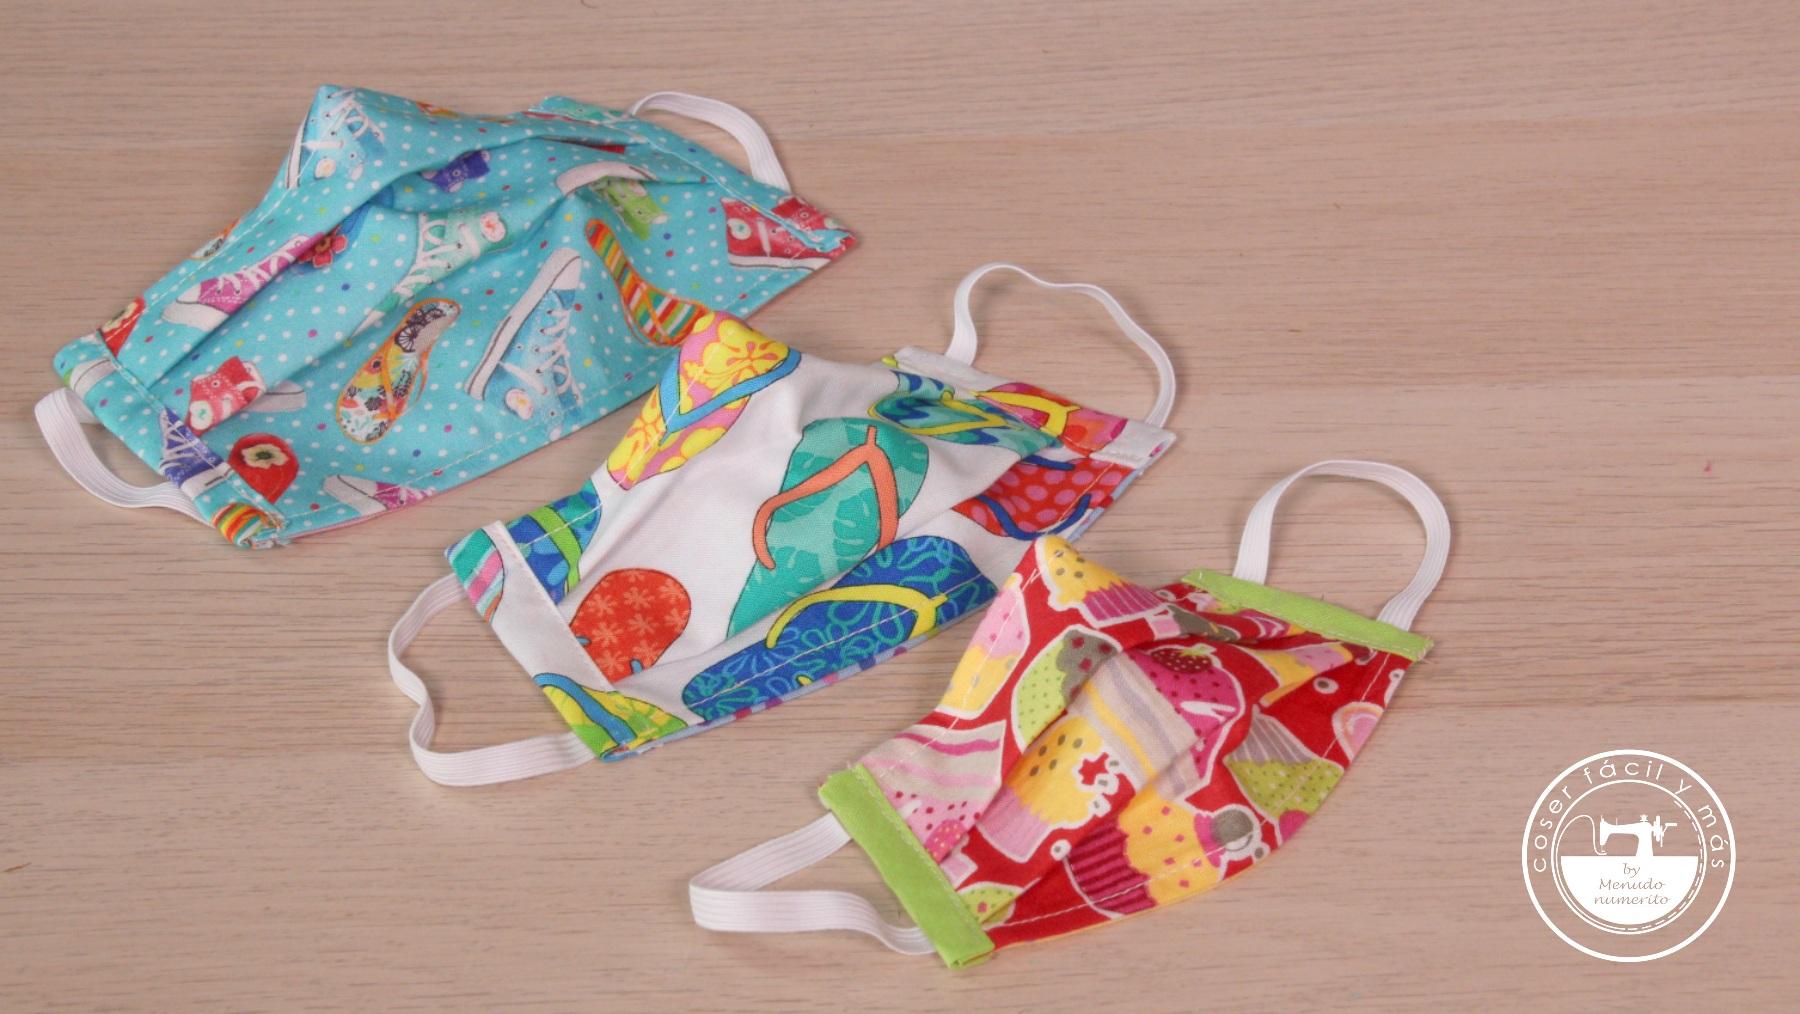 mascarillas para niños blogs de costura menudo numerito coronavirus